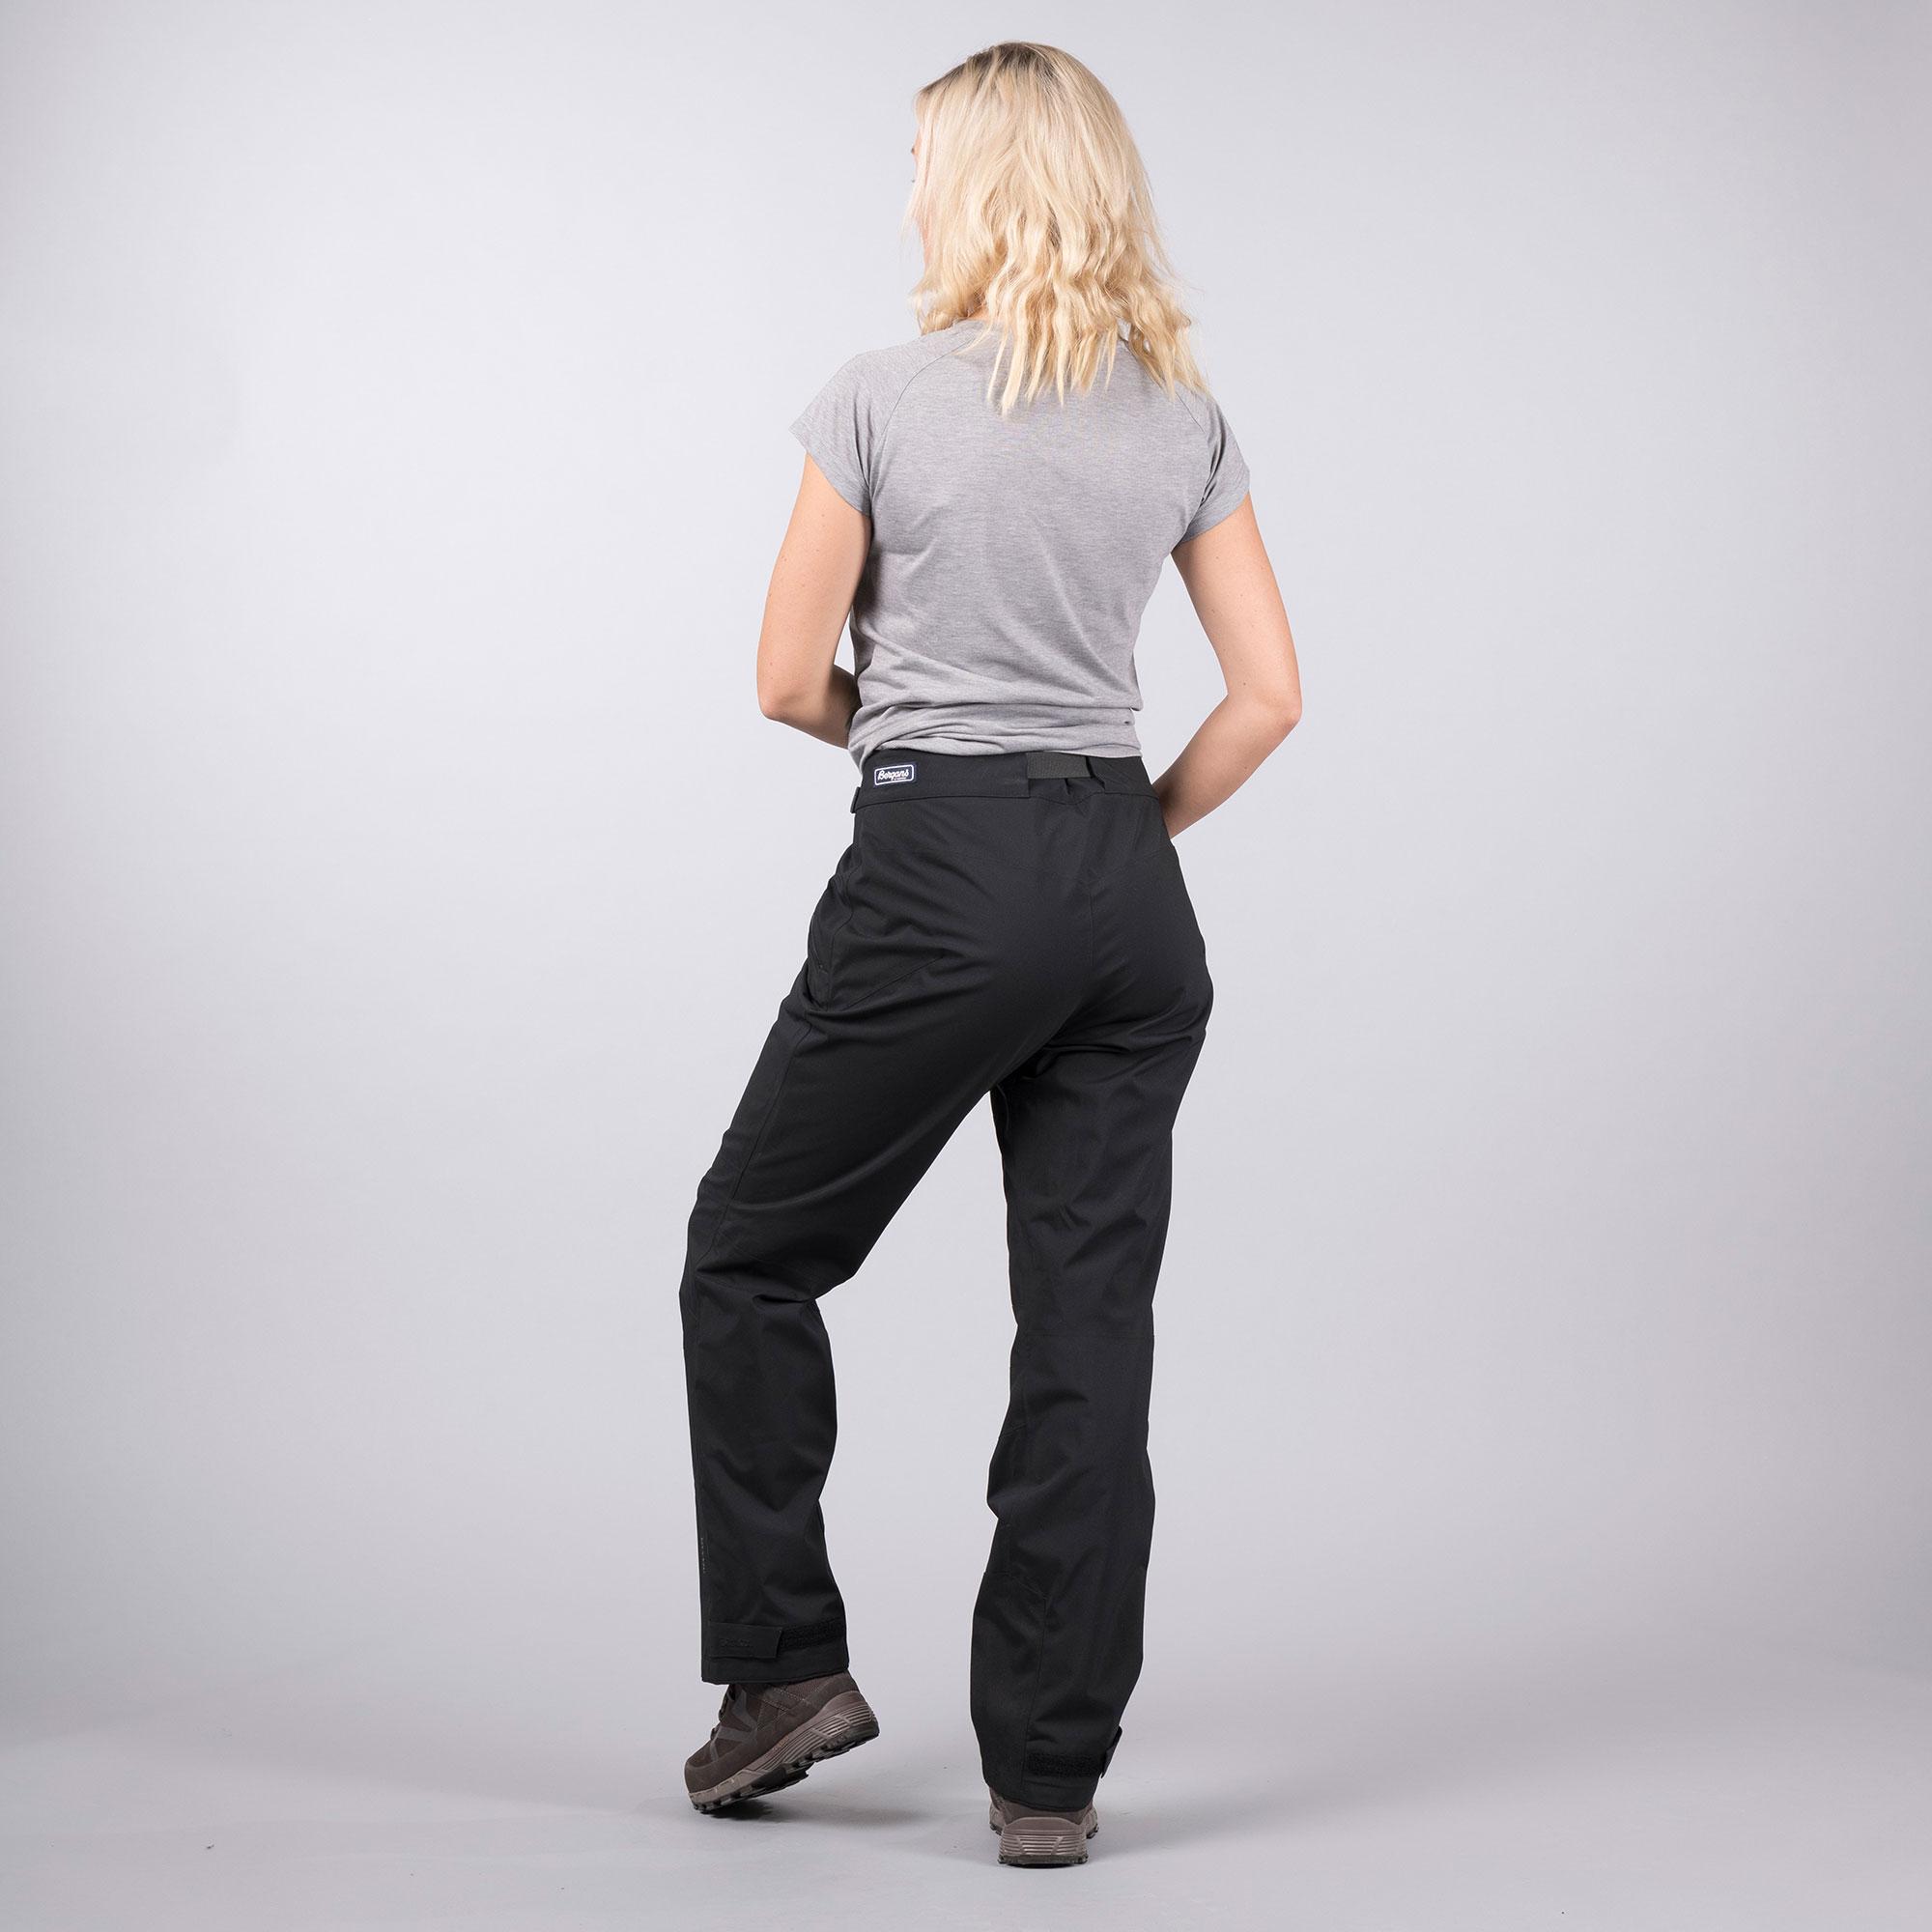 Breheimen 2L W Pants